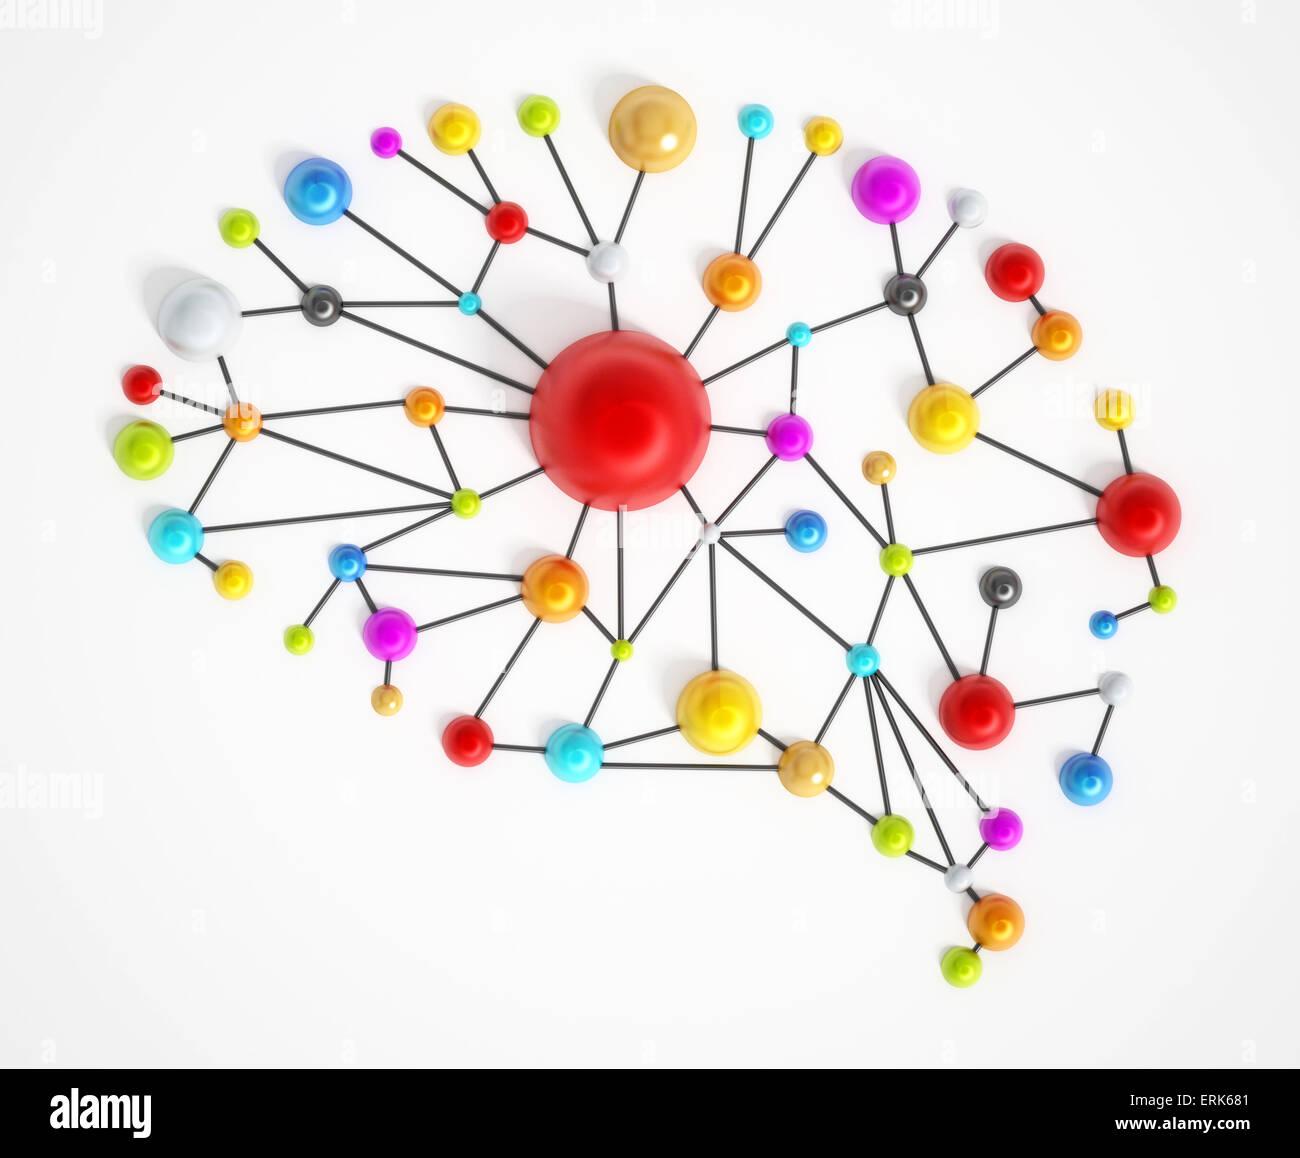 Red cerebral con coloridos puntos conectados. Imagen De Stock